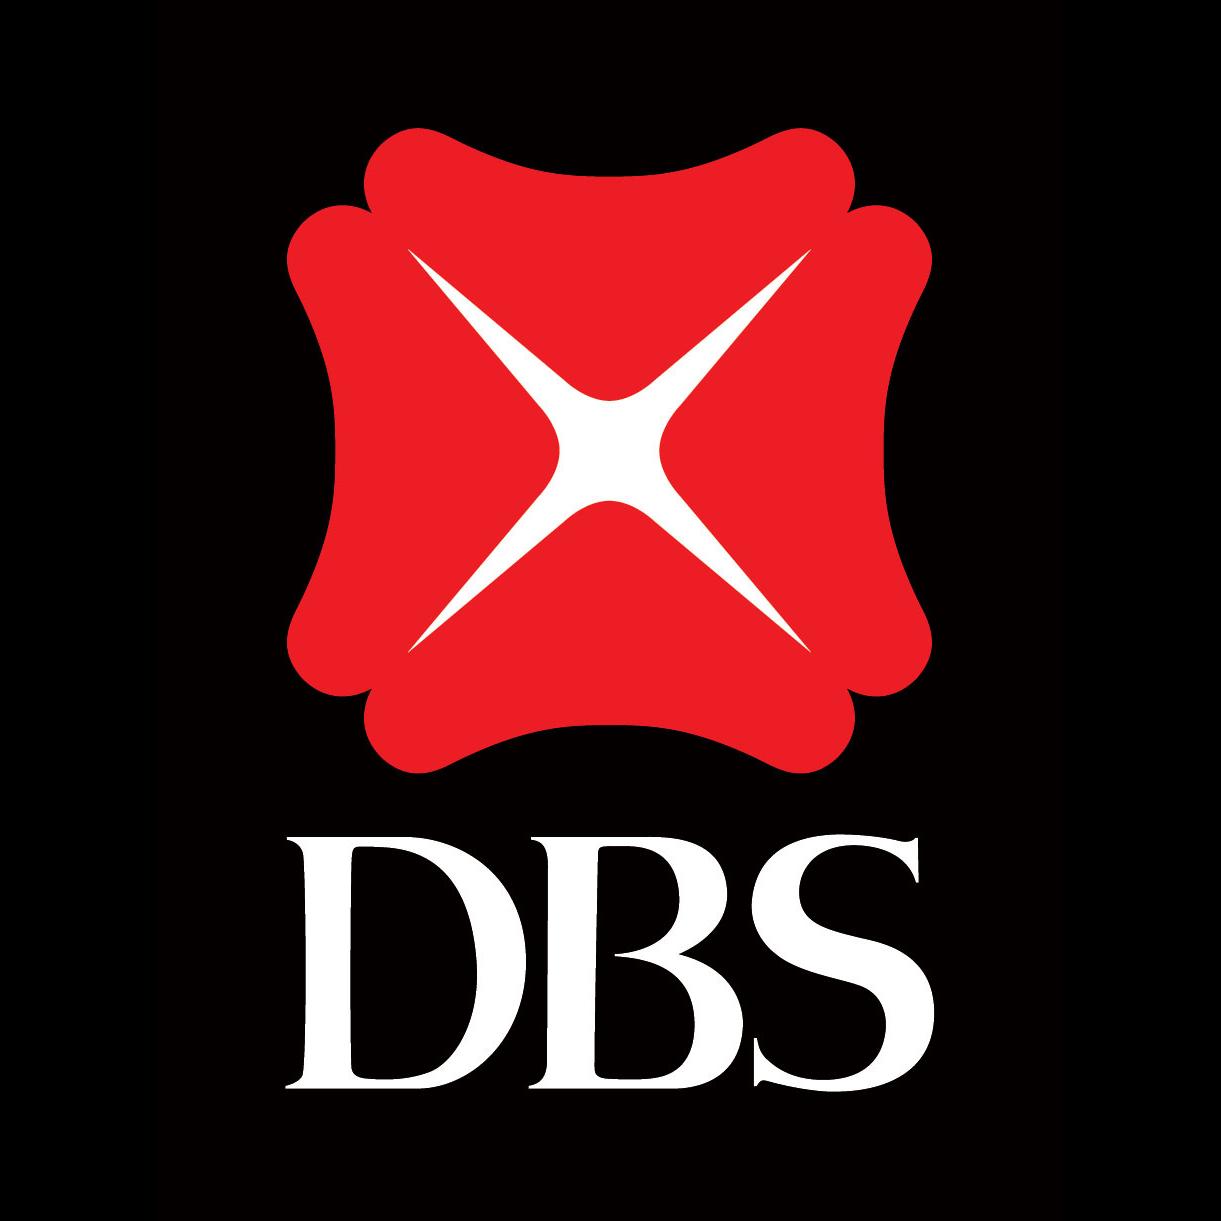 DBS Bank logo - Logo Dbs PNG